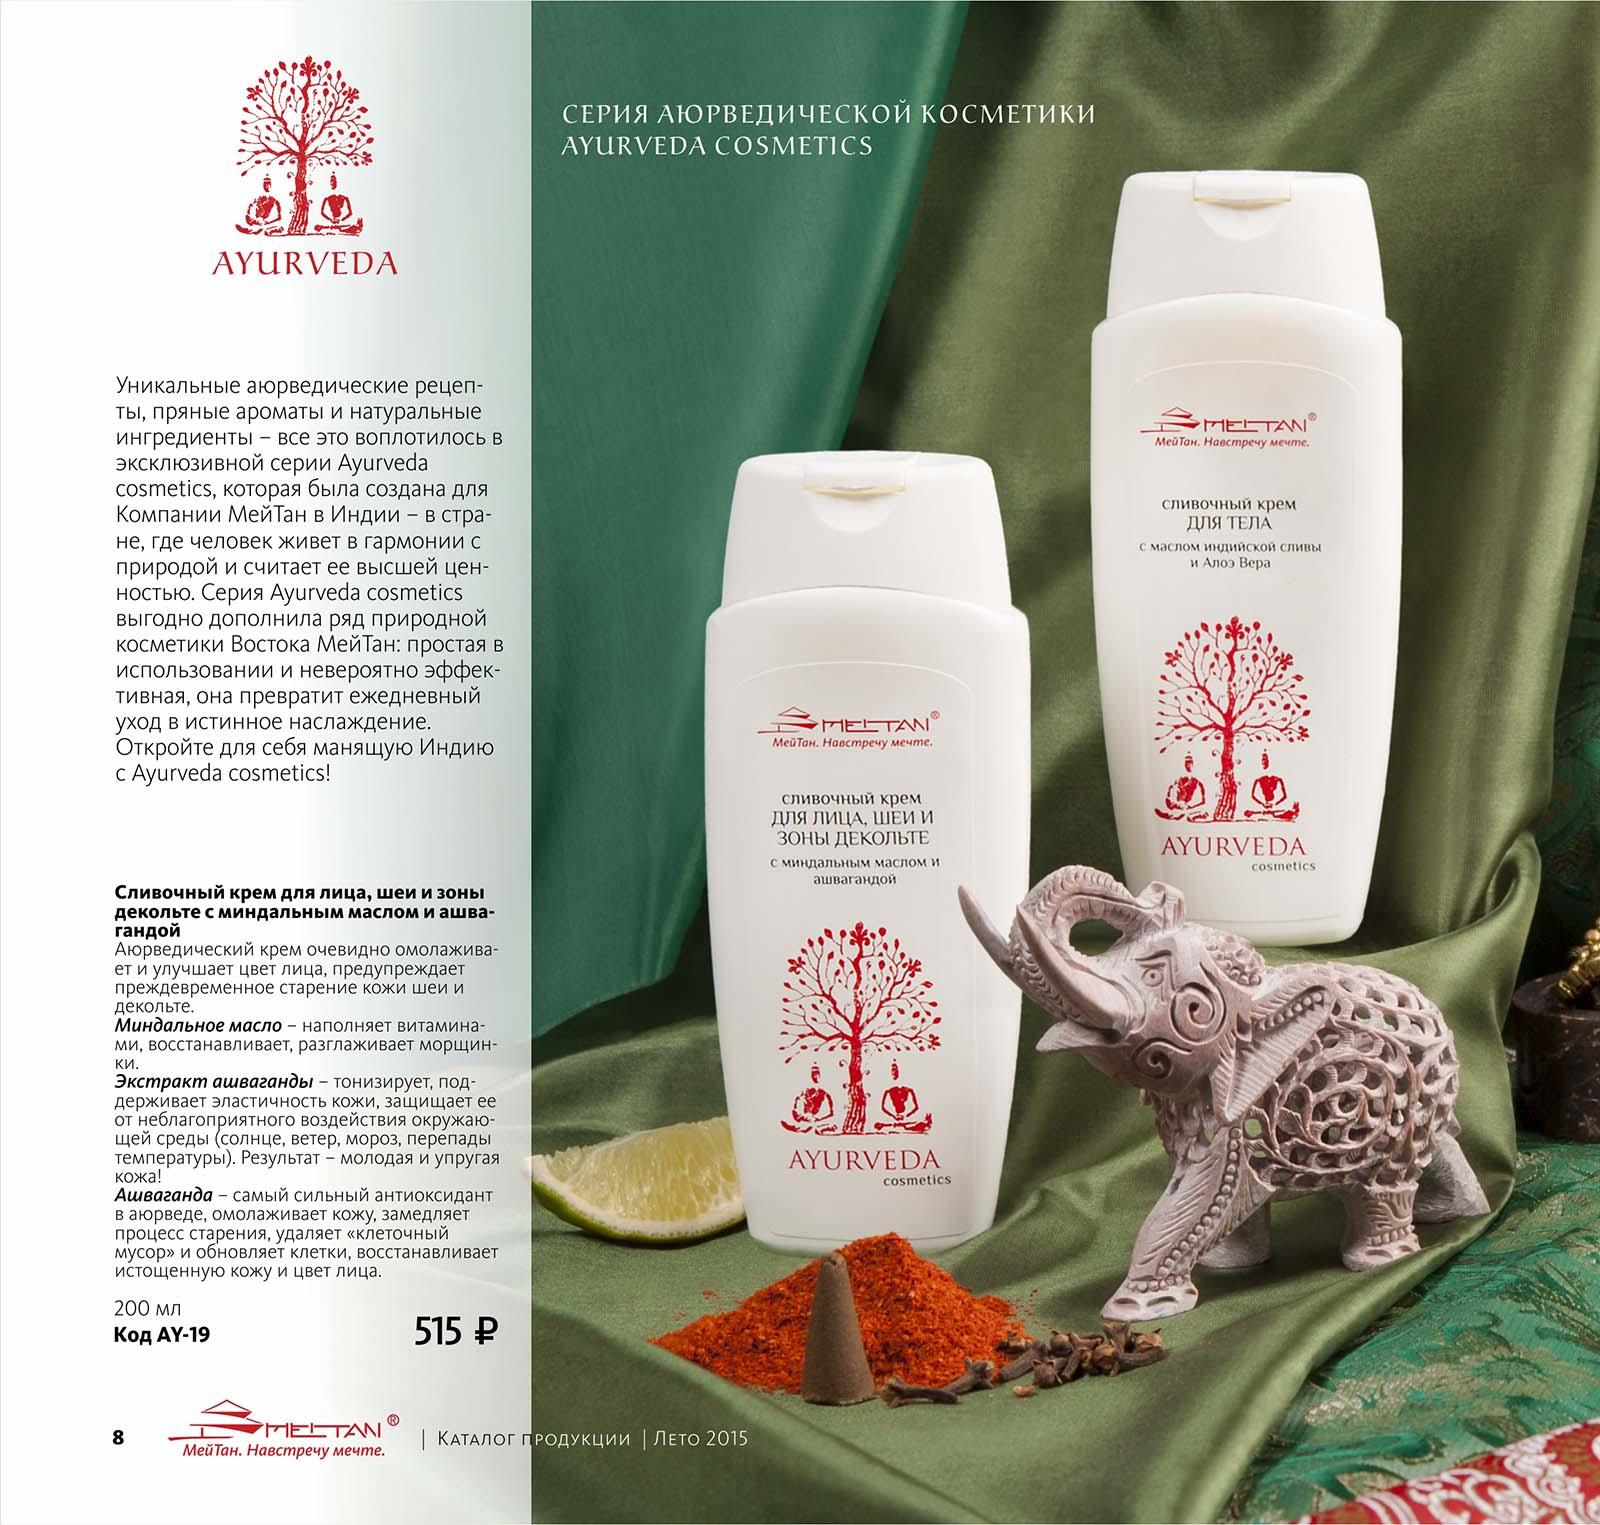 Купить косметику мейтан в красноярске мини каталог avon